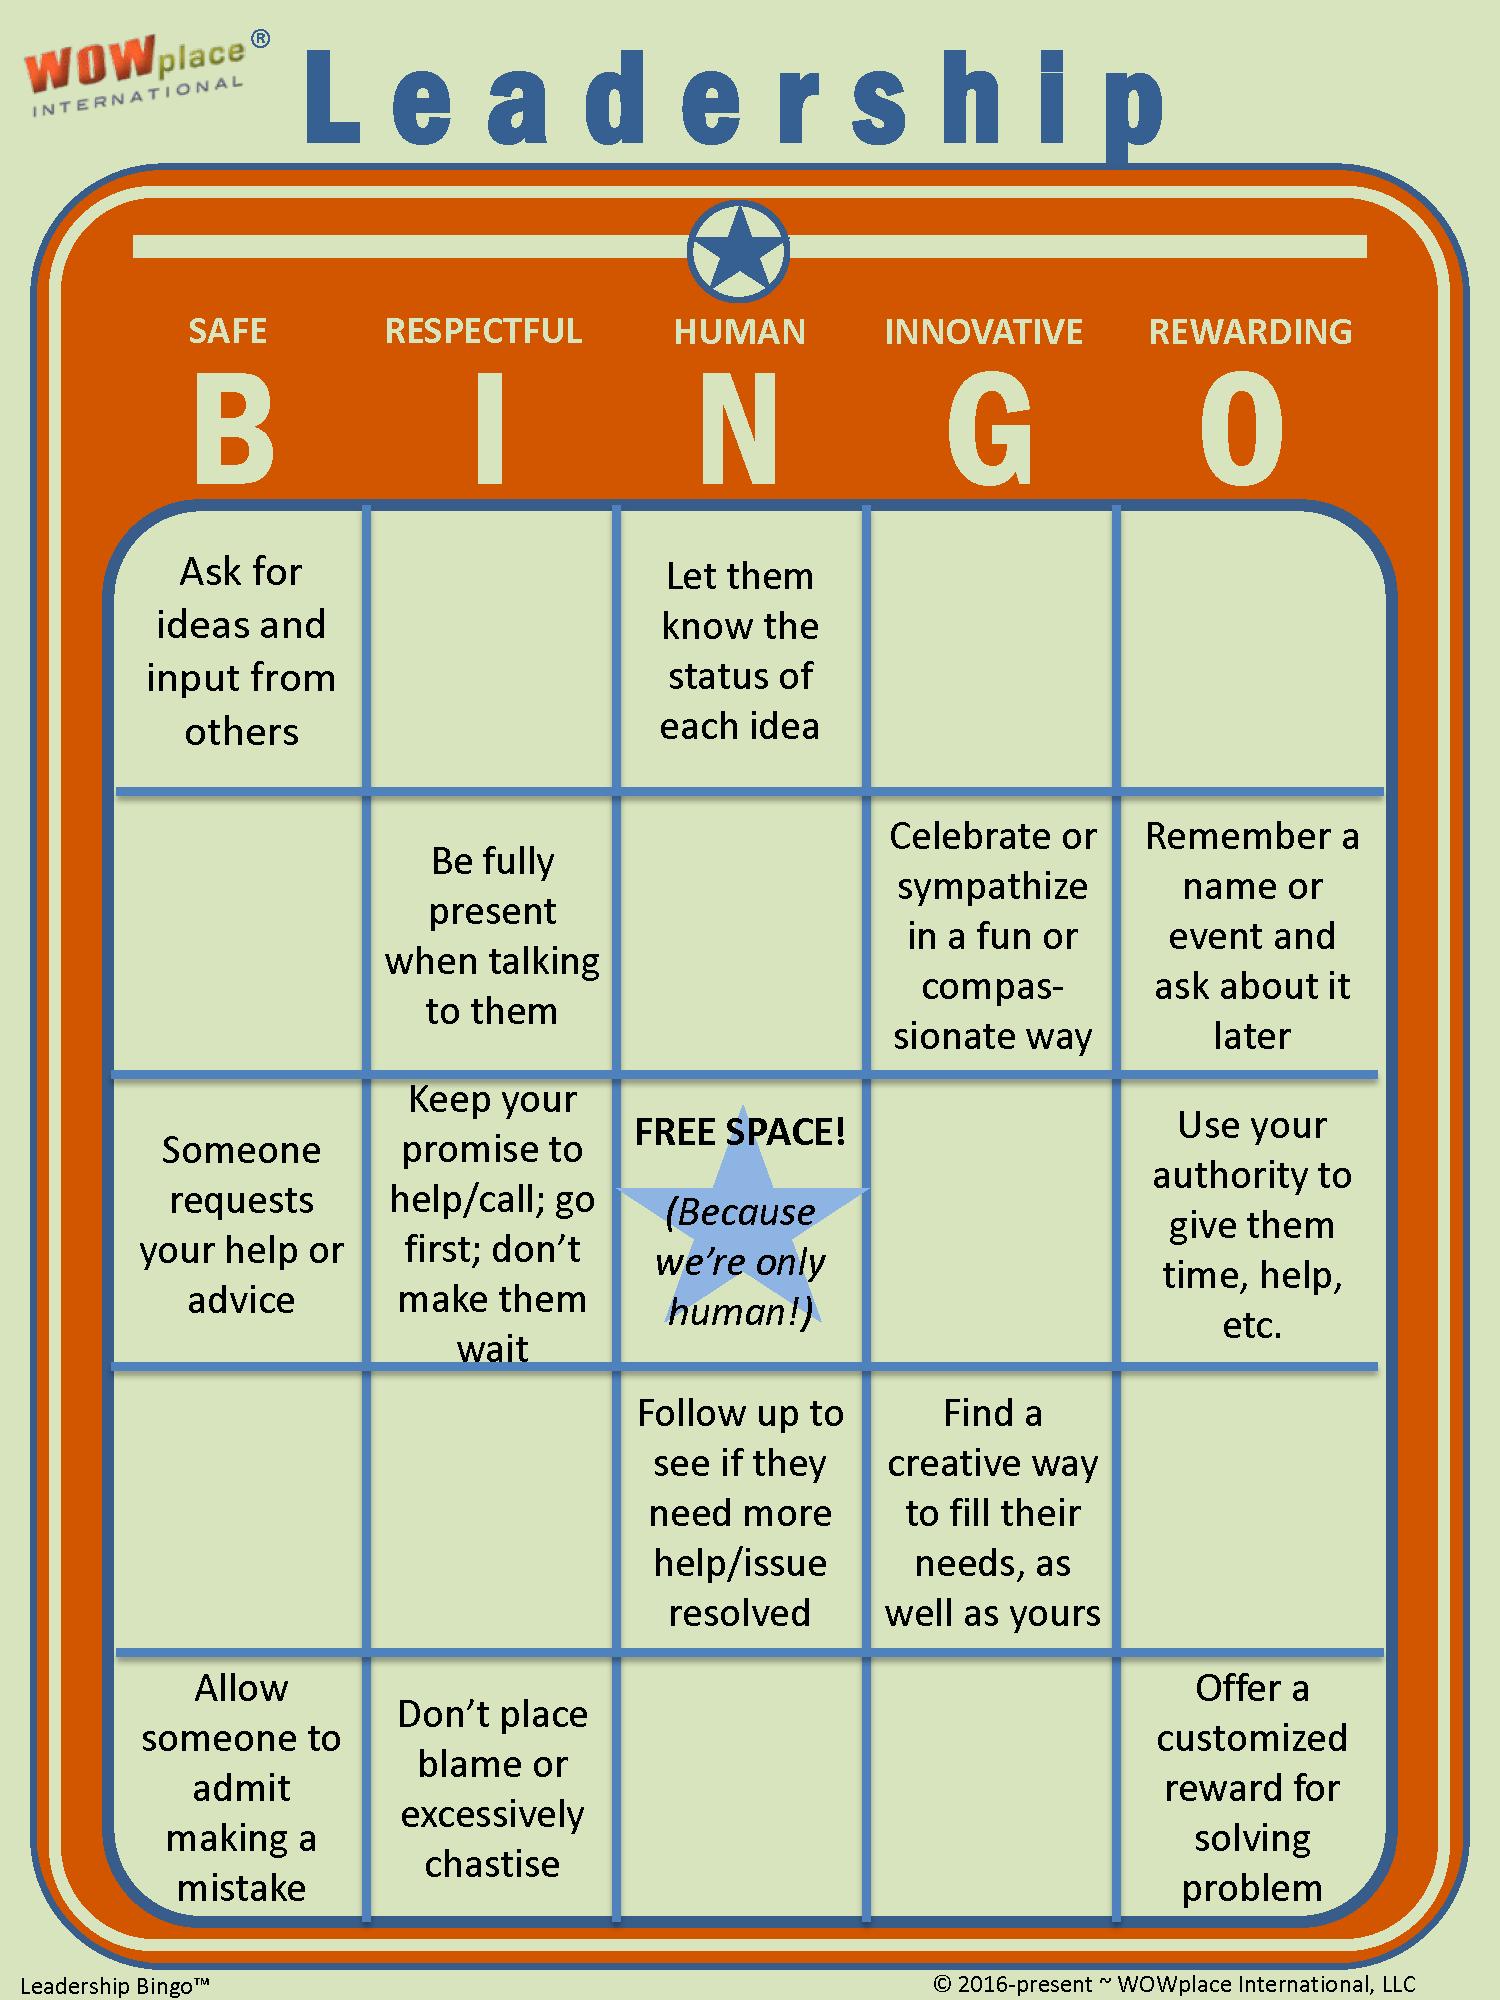 Leadership bingo the game based leadership assessment tool leadership bingo leadership assessment leadership game solutioingenieria Images